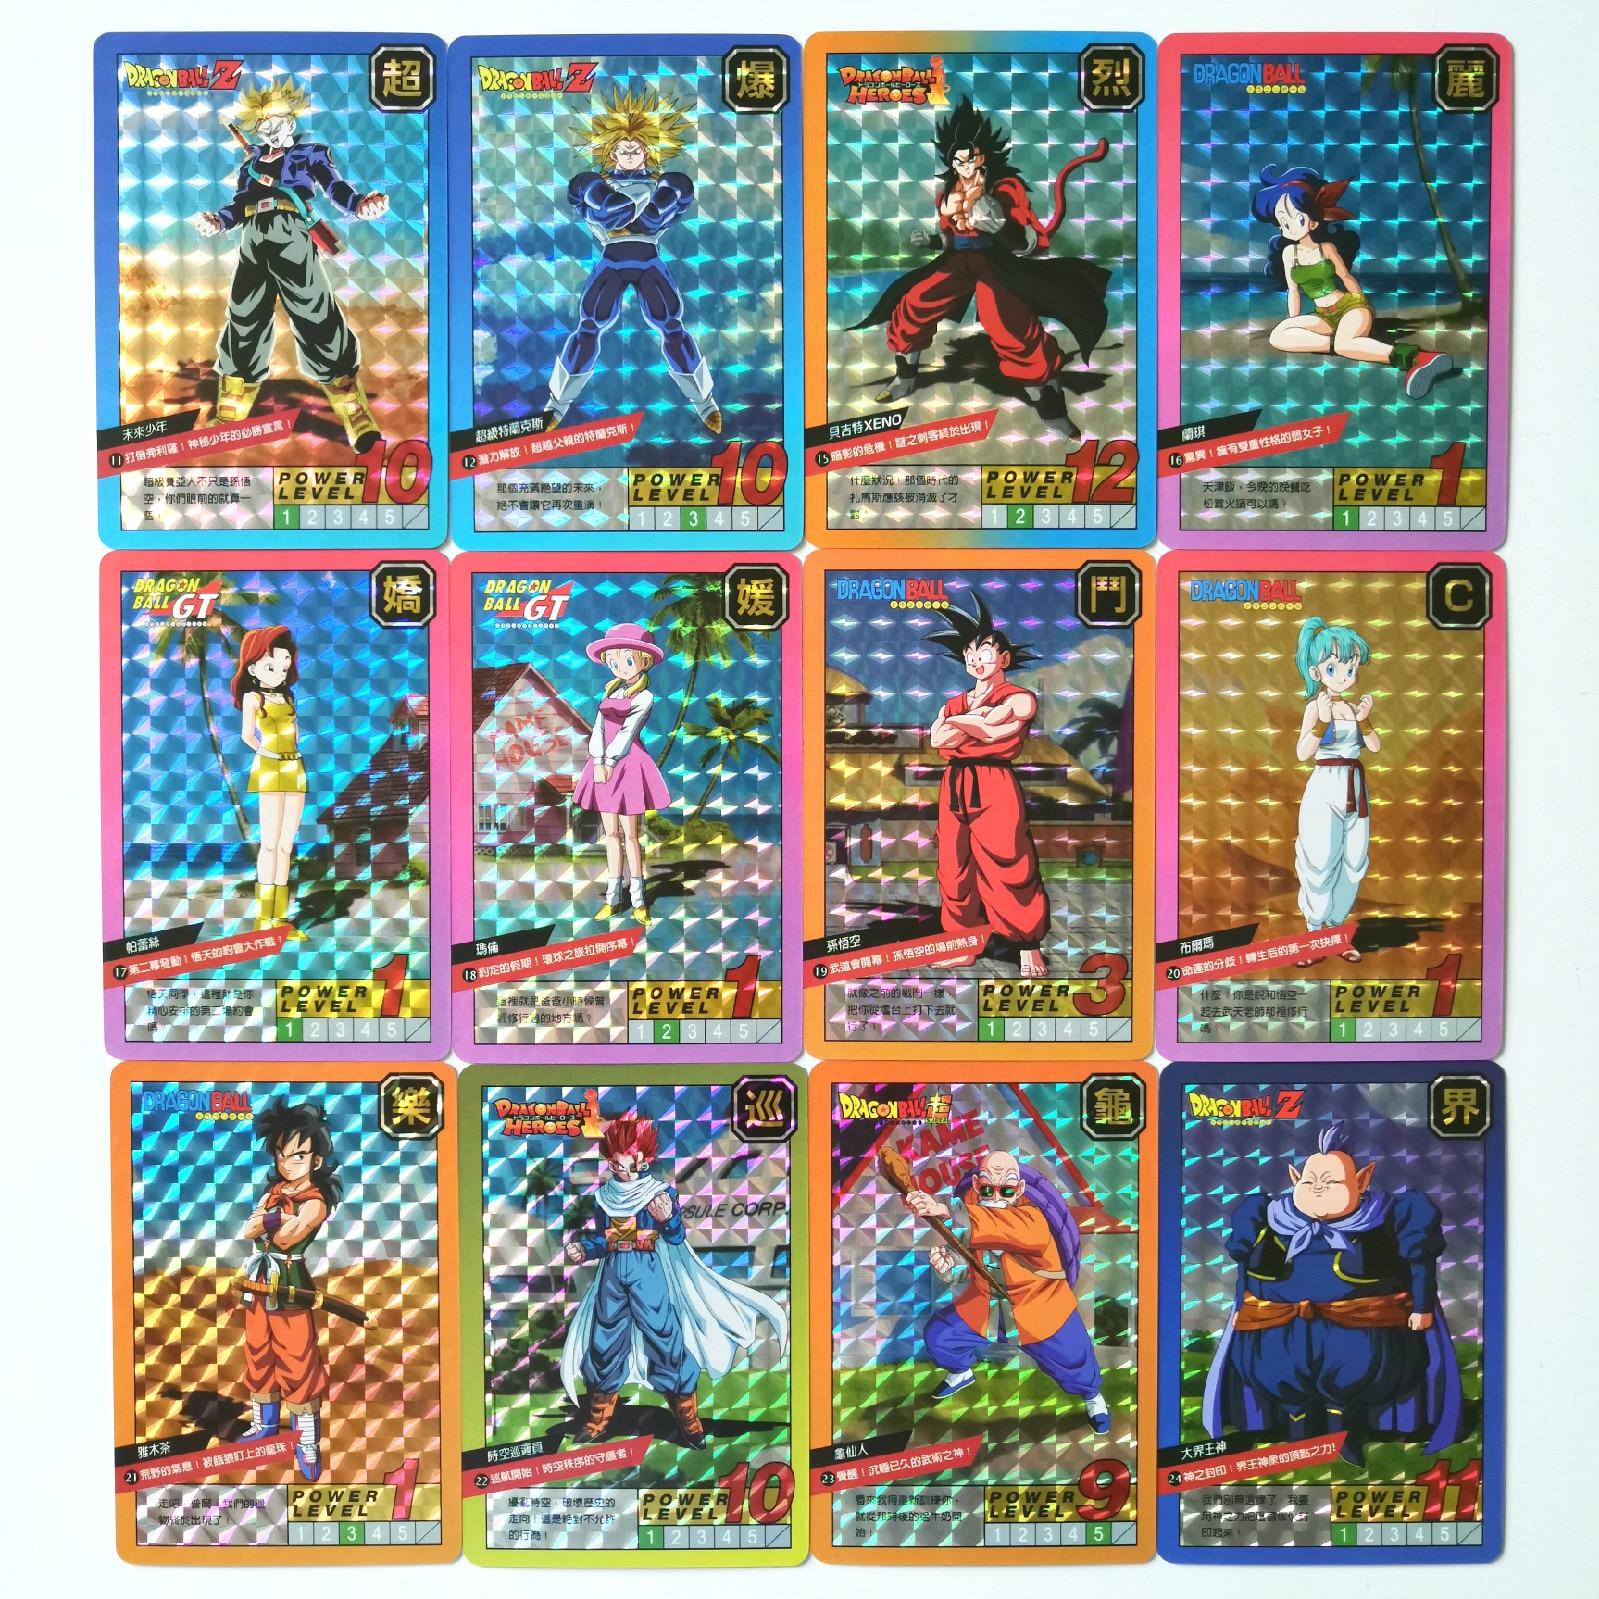 54pcs Super Dragon Ball Z Fight Heroes Battle Card Ultra Instinct Goku Vegeta Game Collection Cards